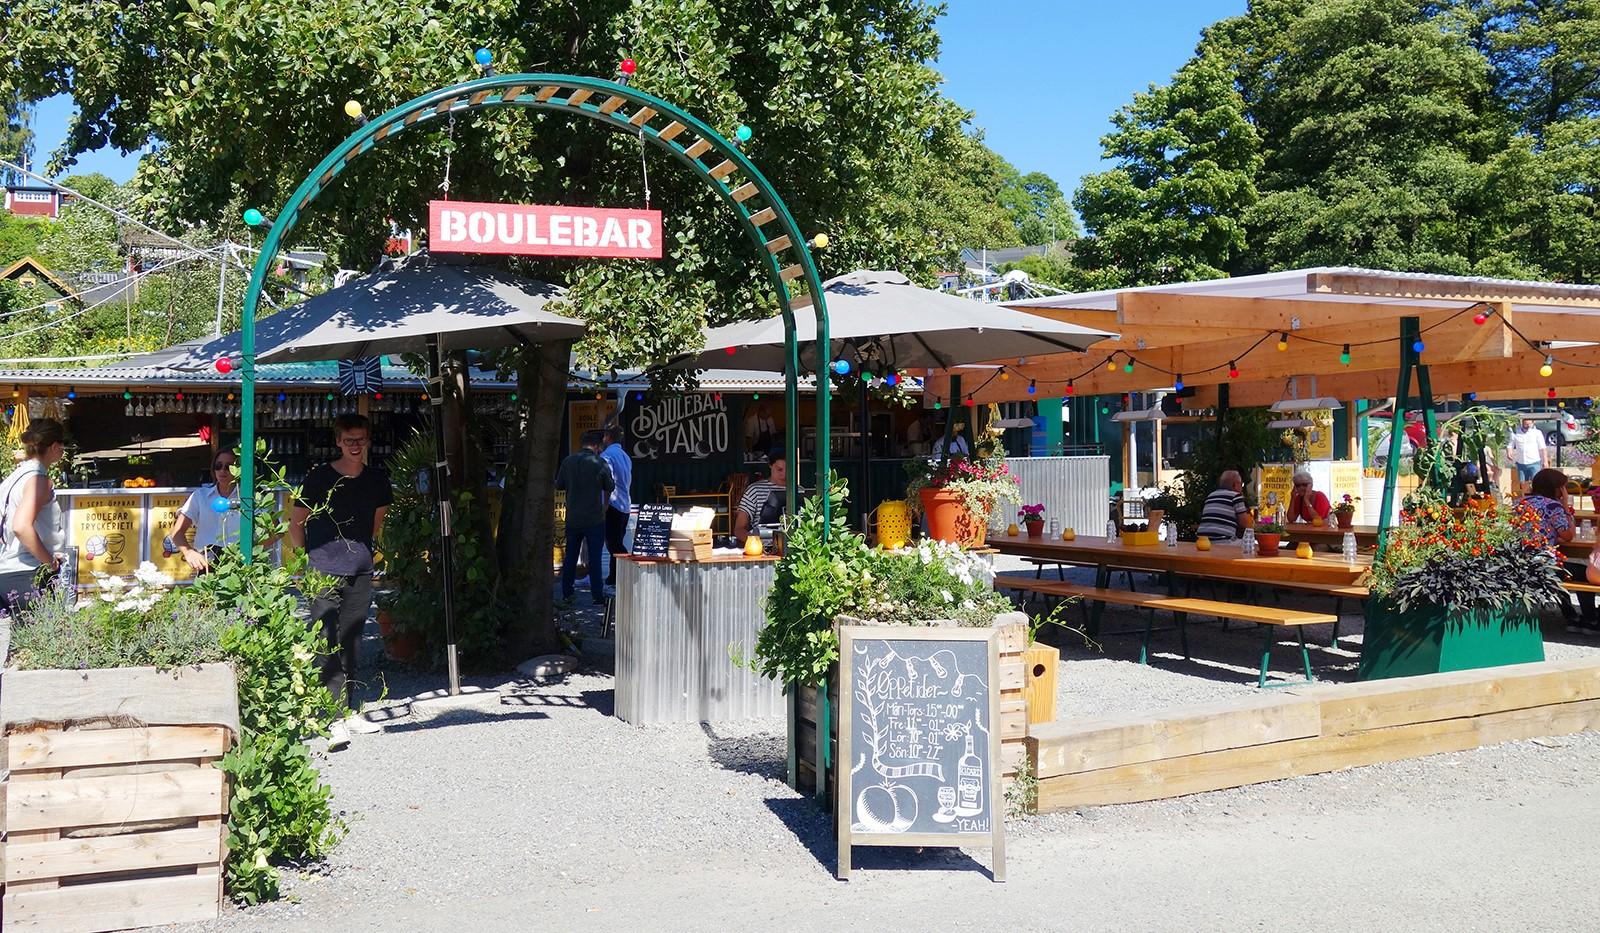 Heleneborgsgatan 38A, 2 tr - Boulebar